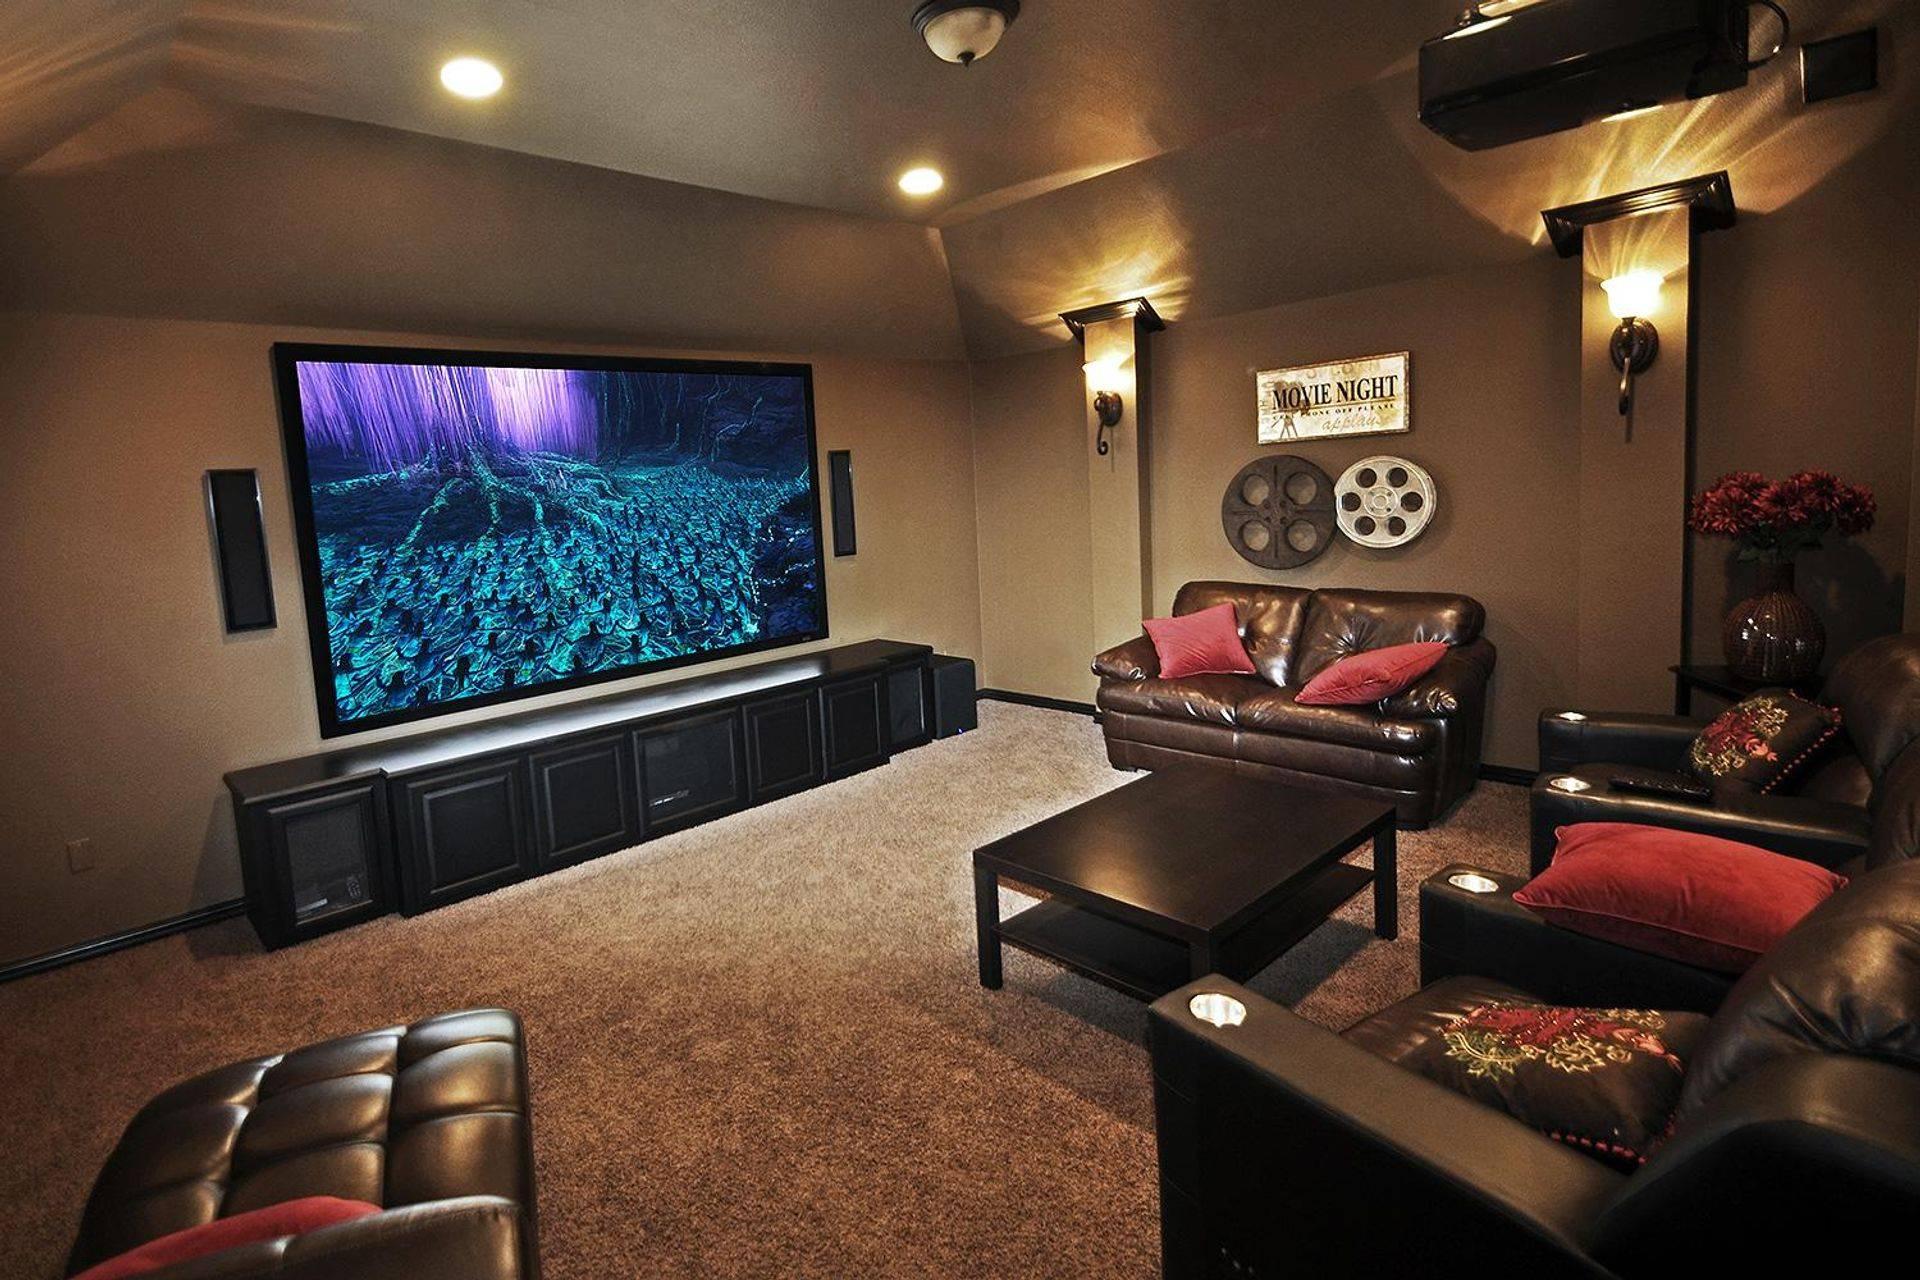 Prewire, Design service, Screen, Projector, TV Aerial, Repairs, Installation, In home service